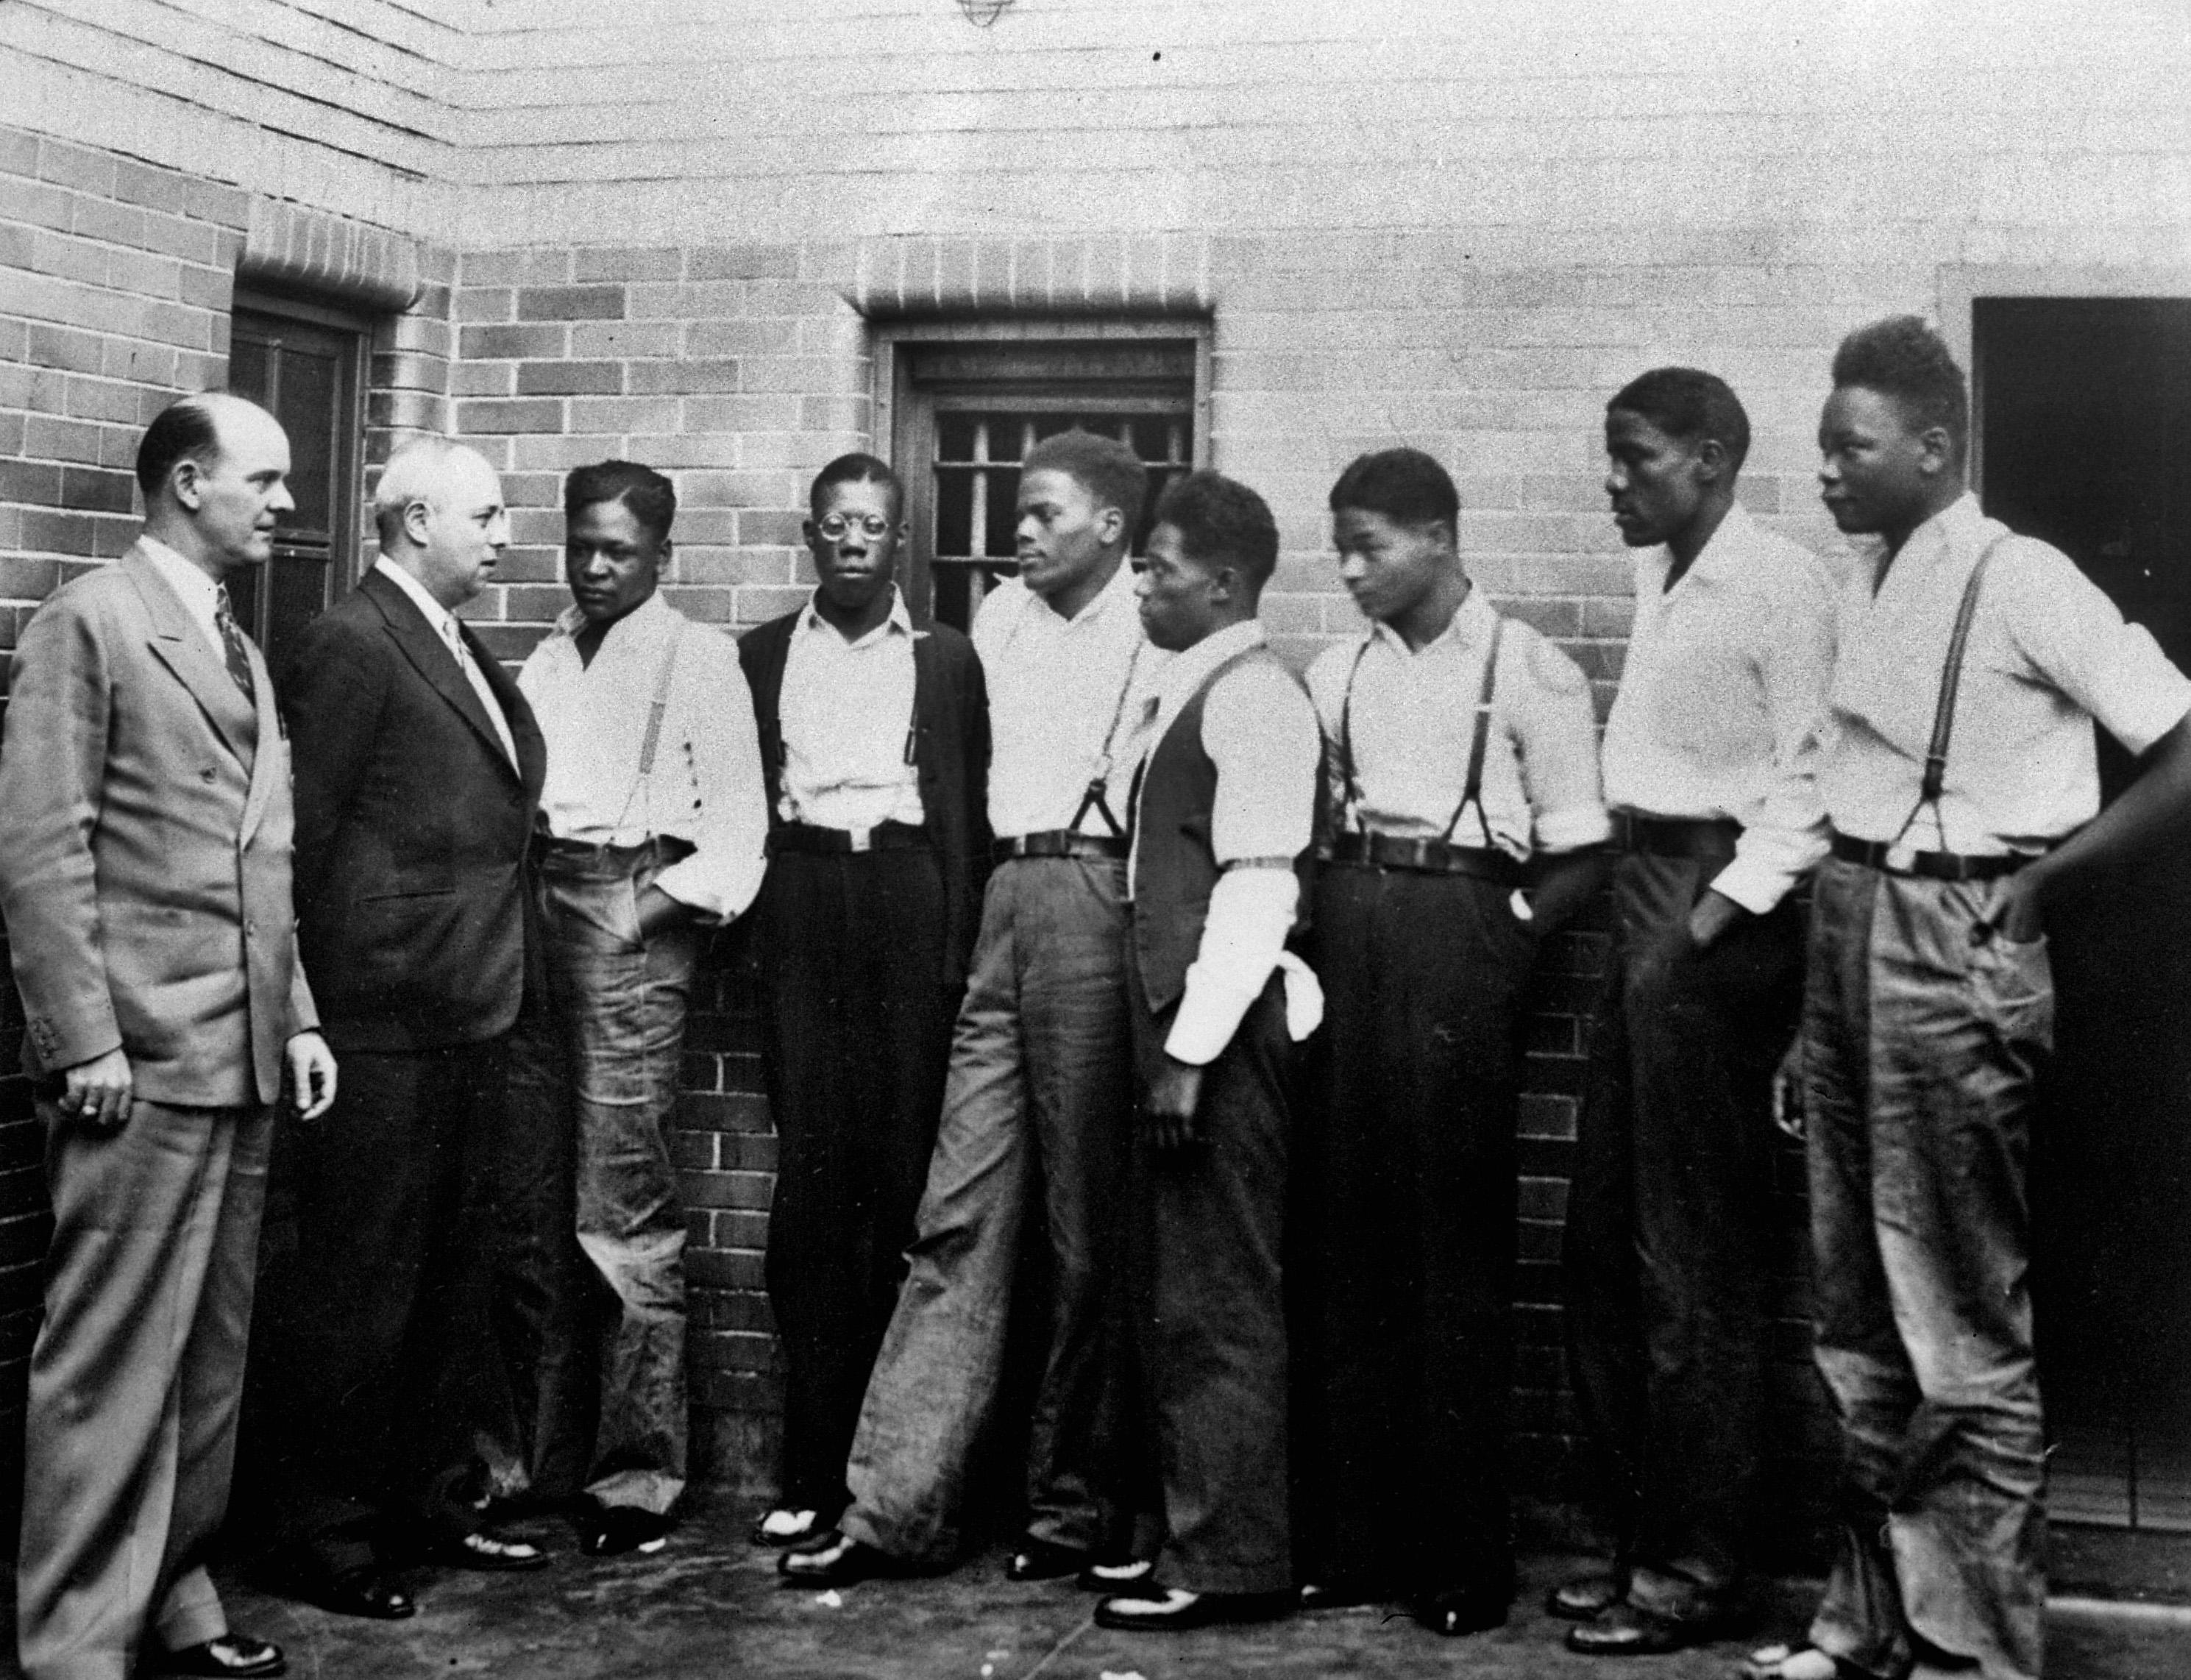 Personals in scottsboro alabama